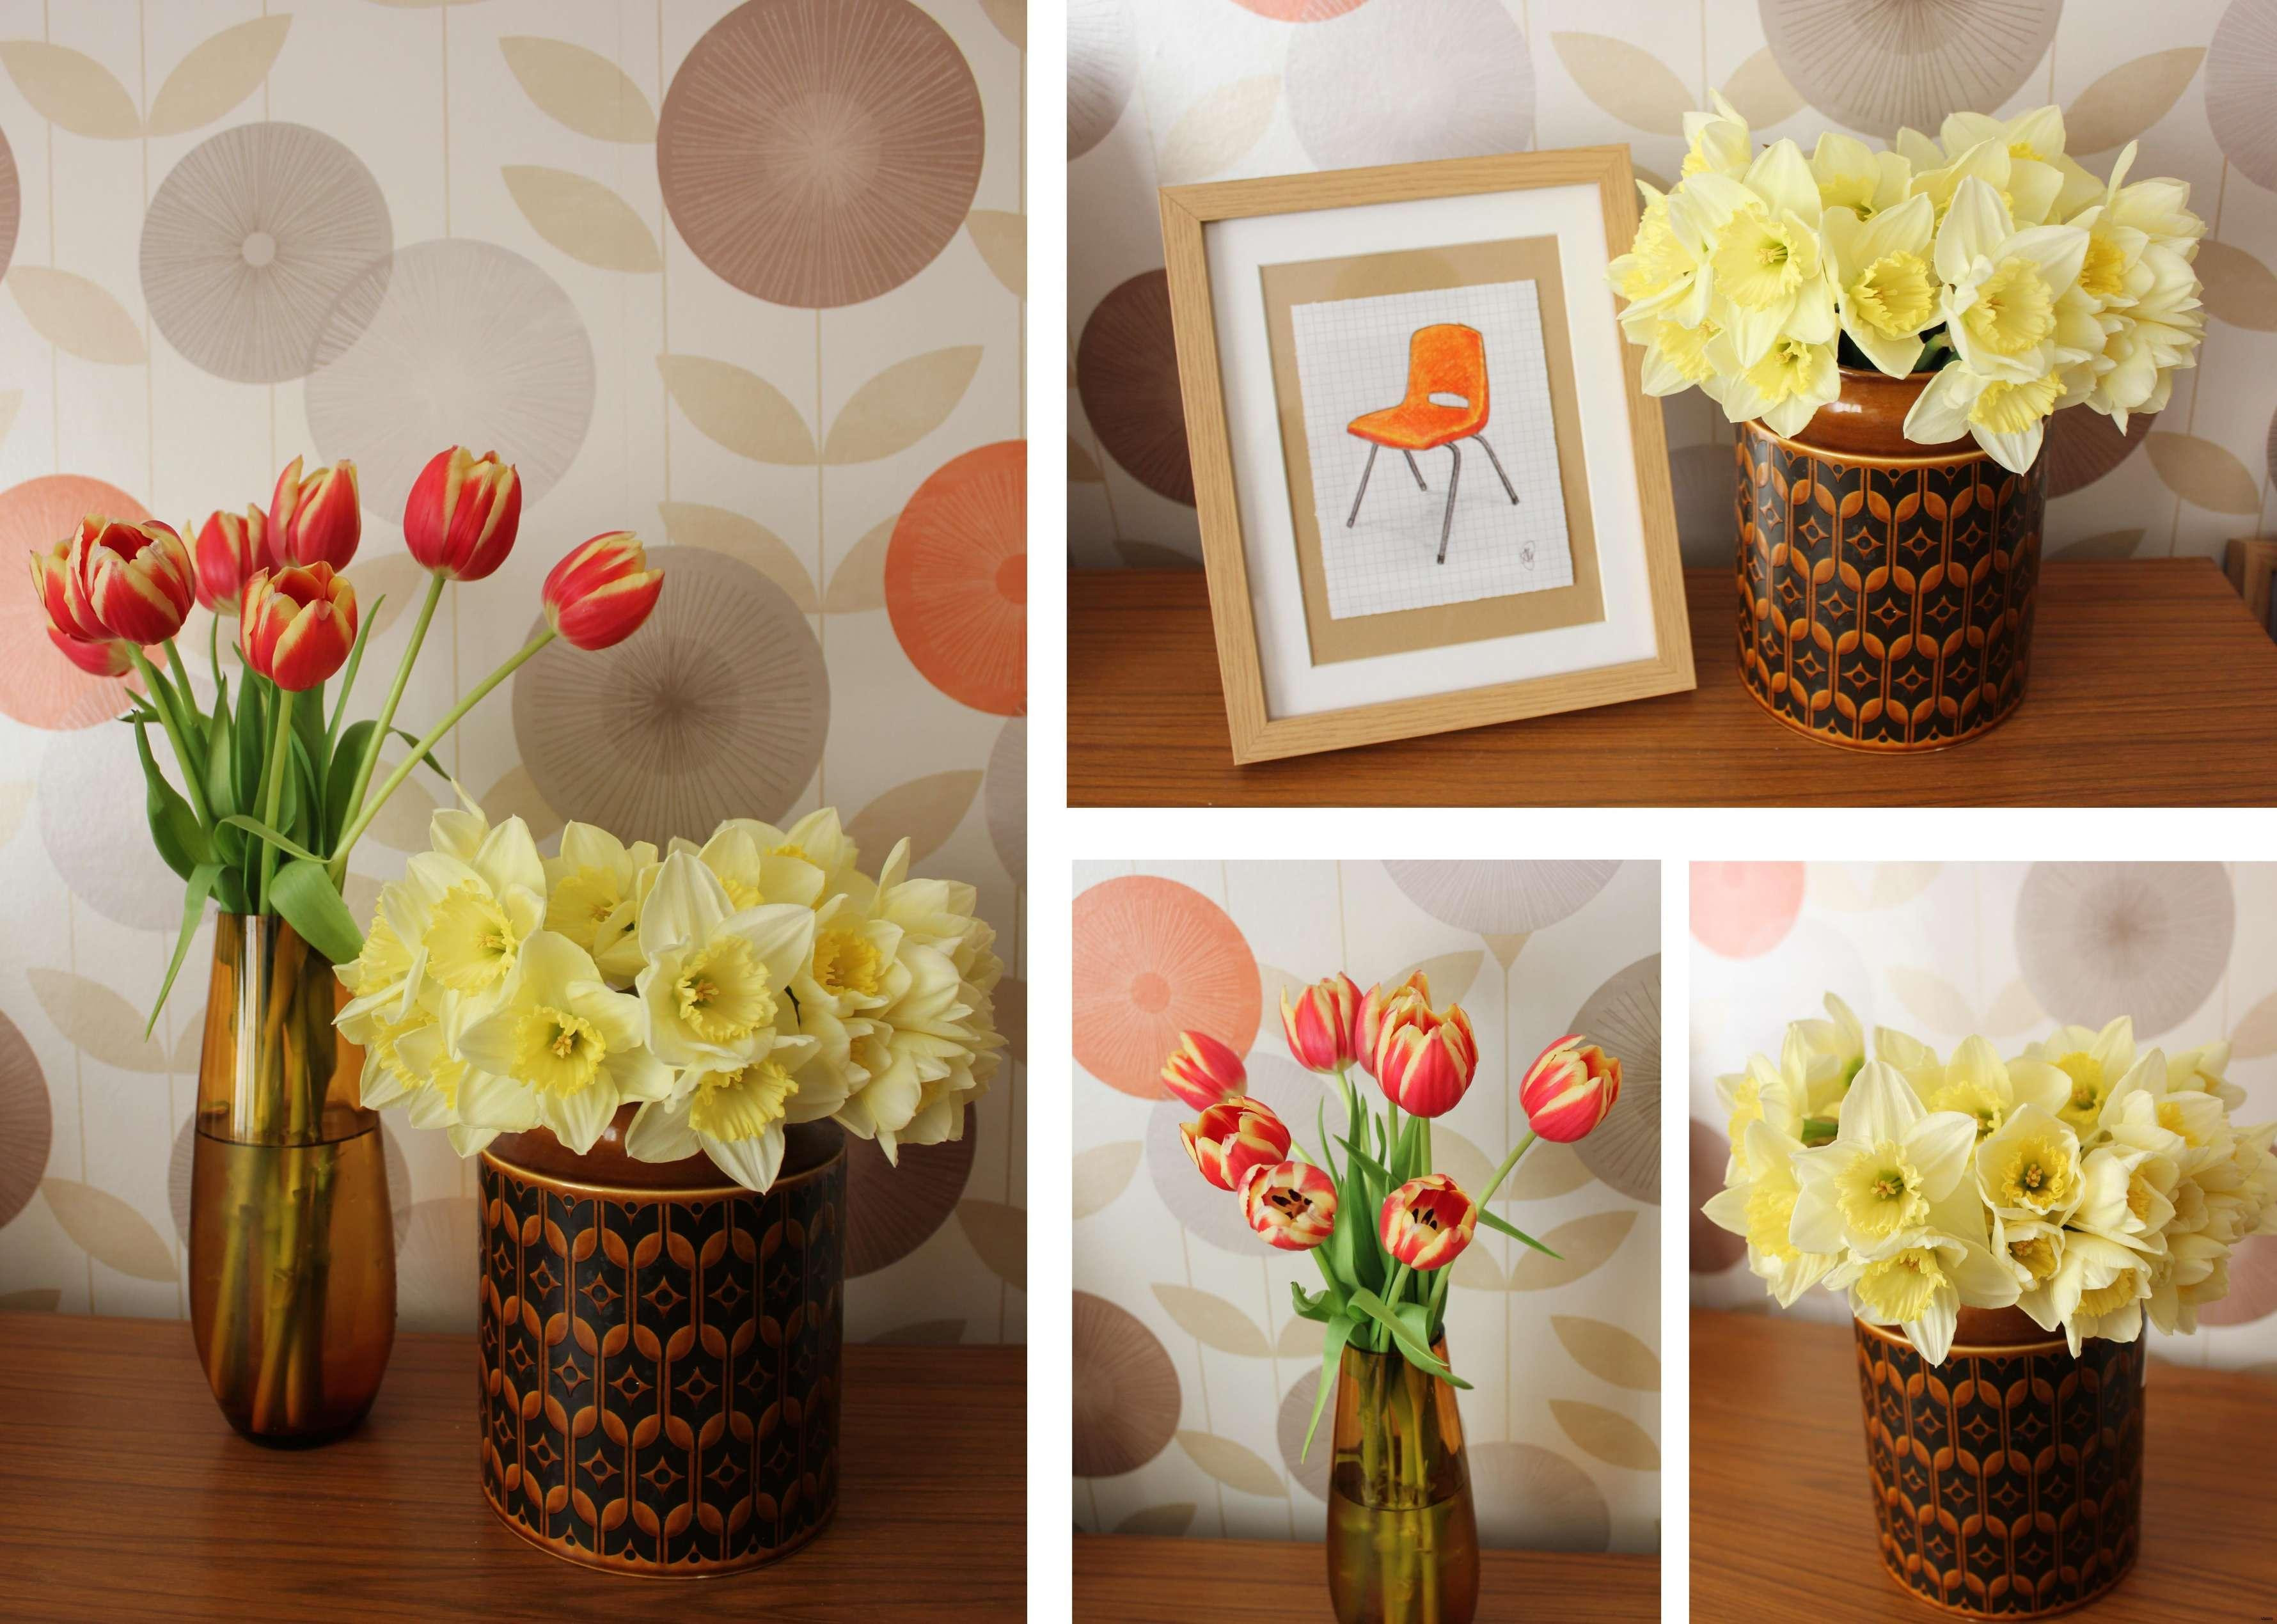 Vase for Long Stem Flowers Of Easy Diy Ideas Fresh Diy Home Decor Vaseh Vases Decorative Flower Pertaining to Easy Diy Ideas Fresh Diy Home Decor Vaseh Vases Decorative Flower Ideas I 0d Design Ideas